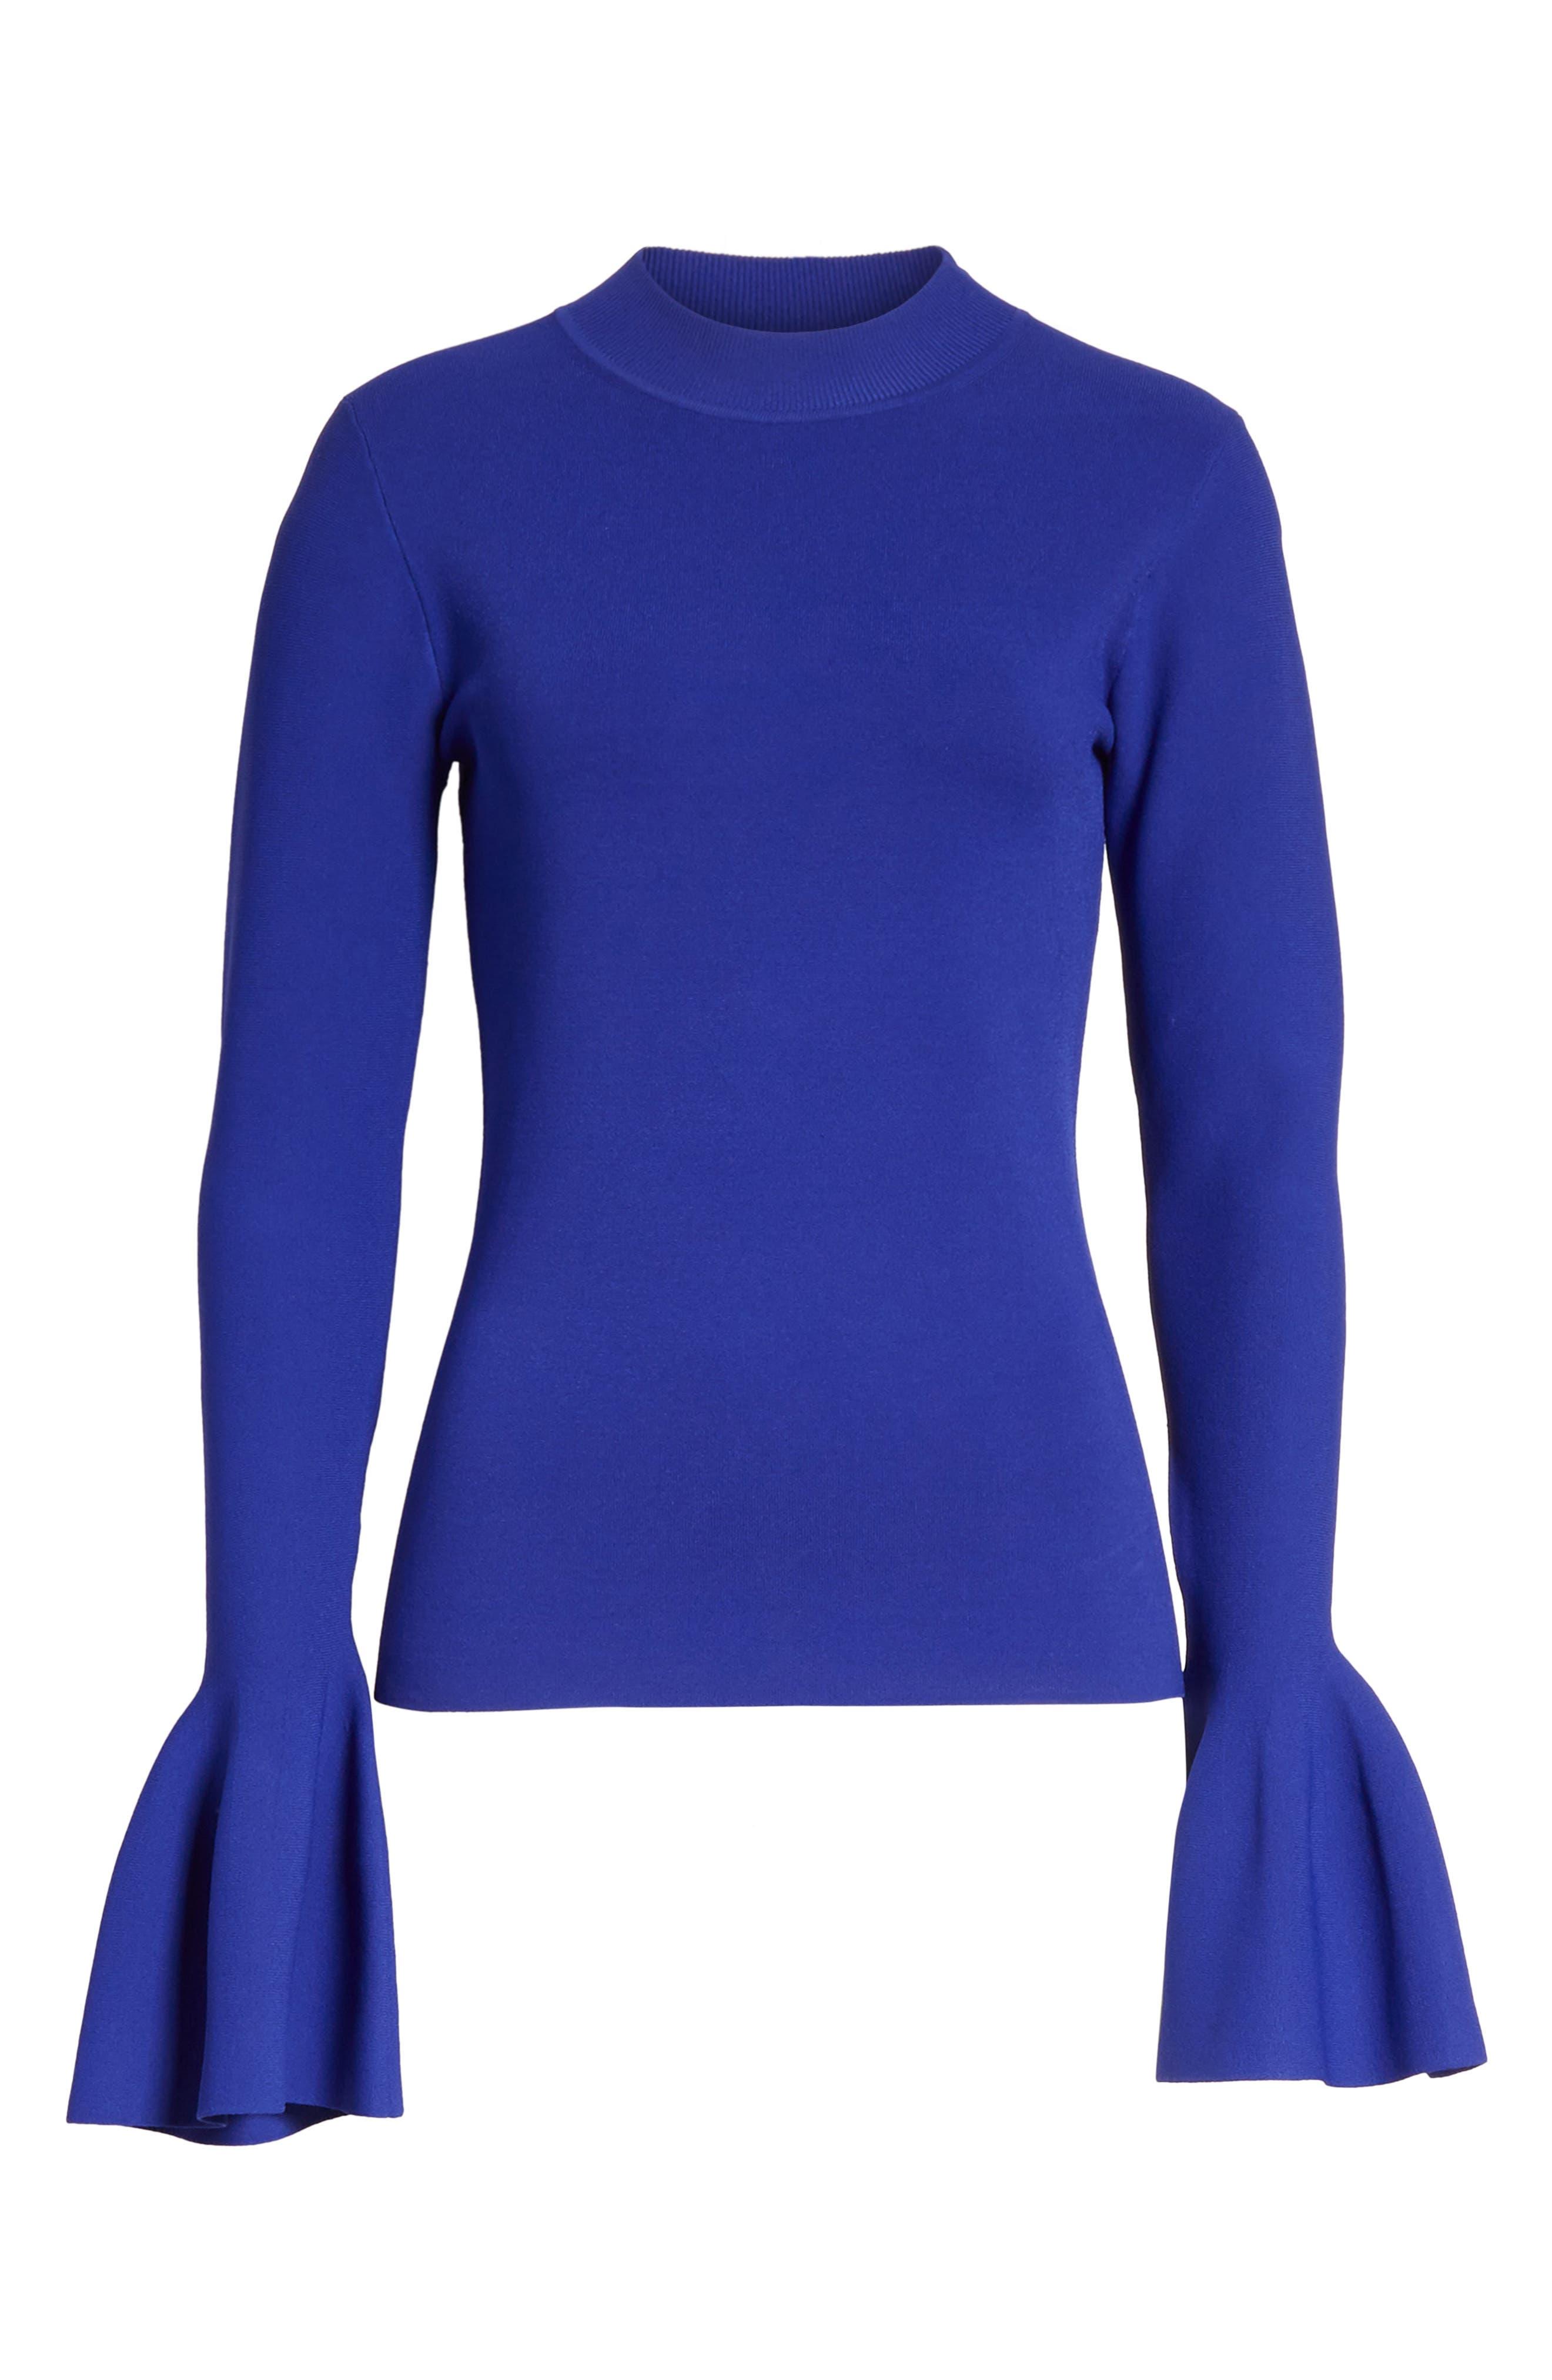 Flutter Sleeve Mock Neck Sweater,                             Alternate thumbnail 6, color,                             Electric Blue